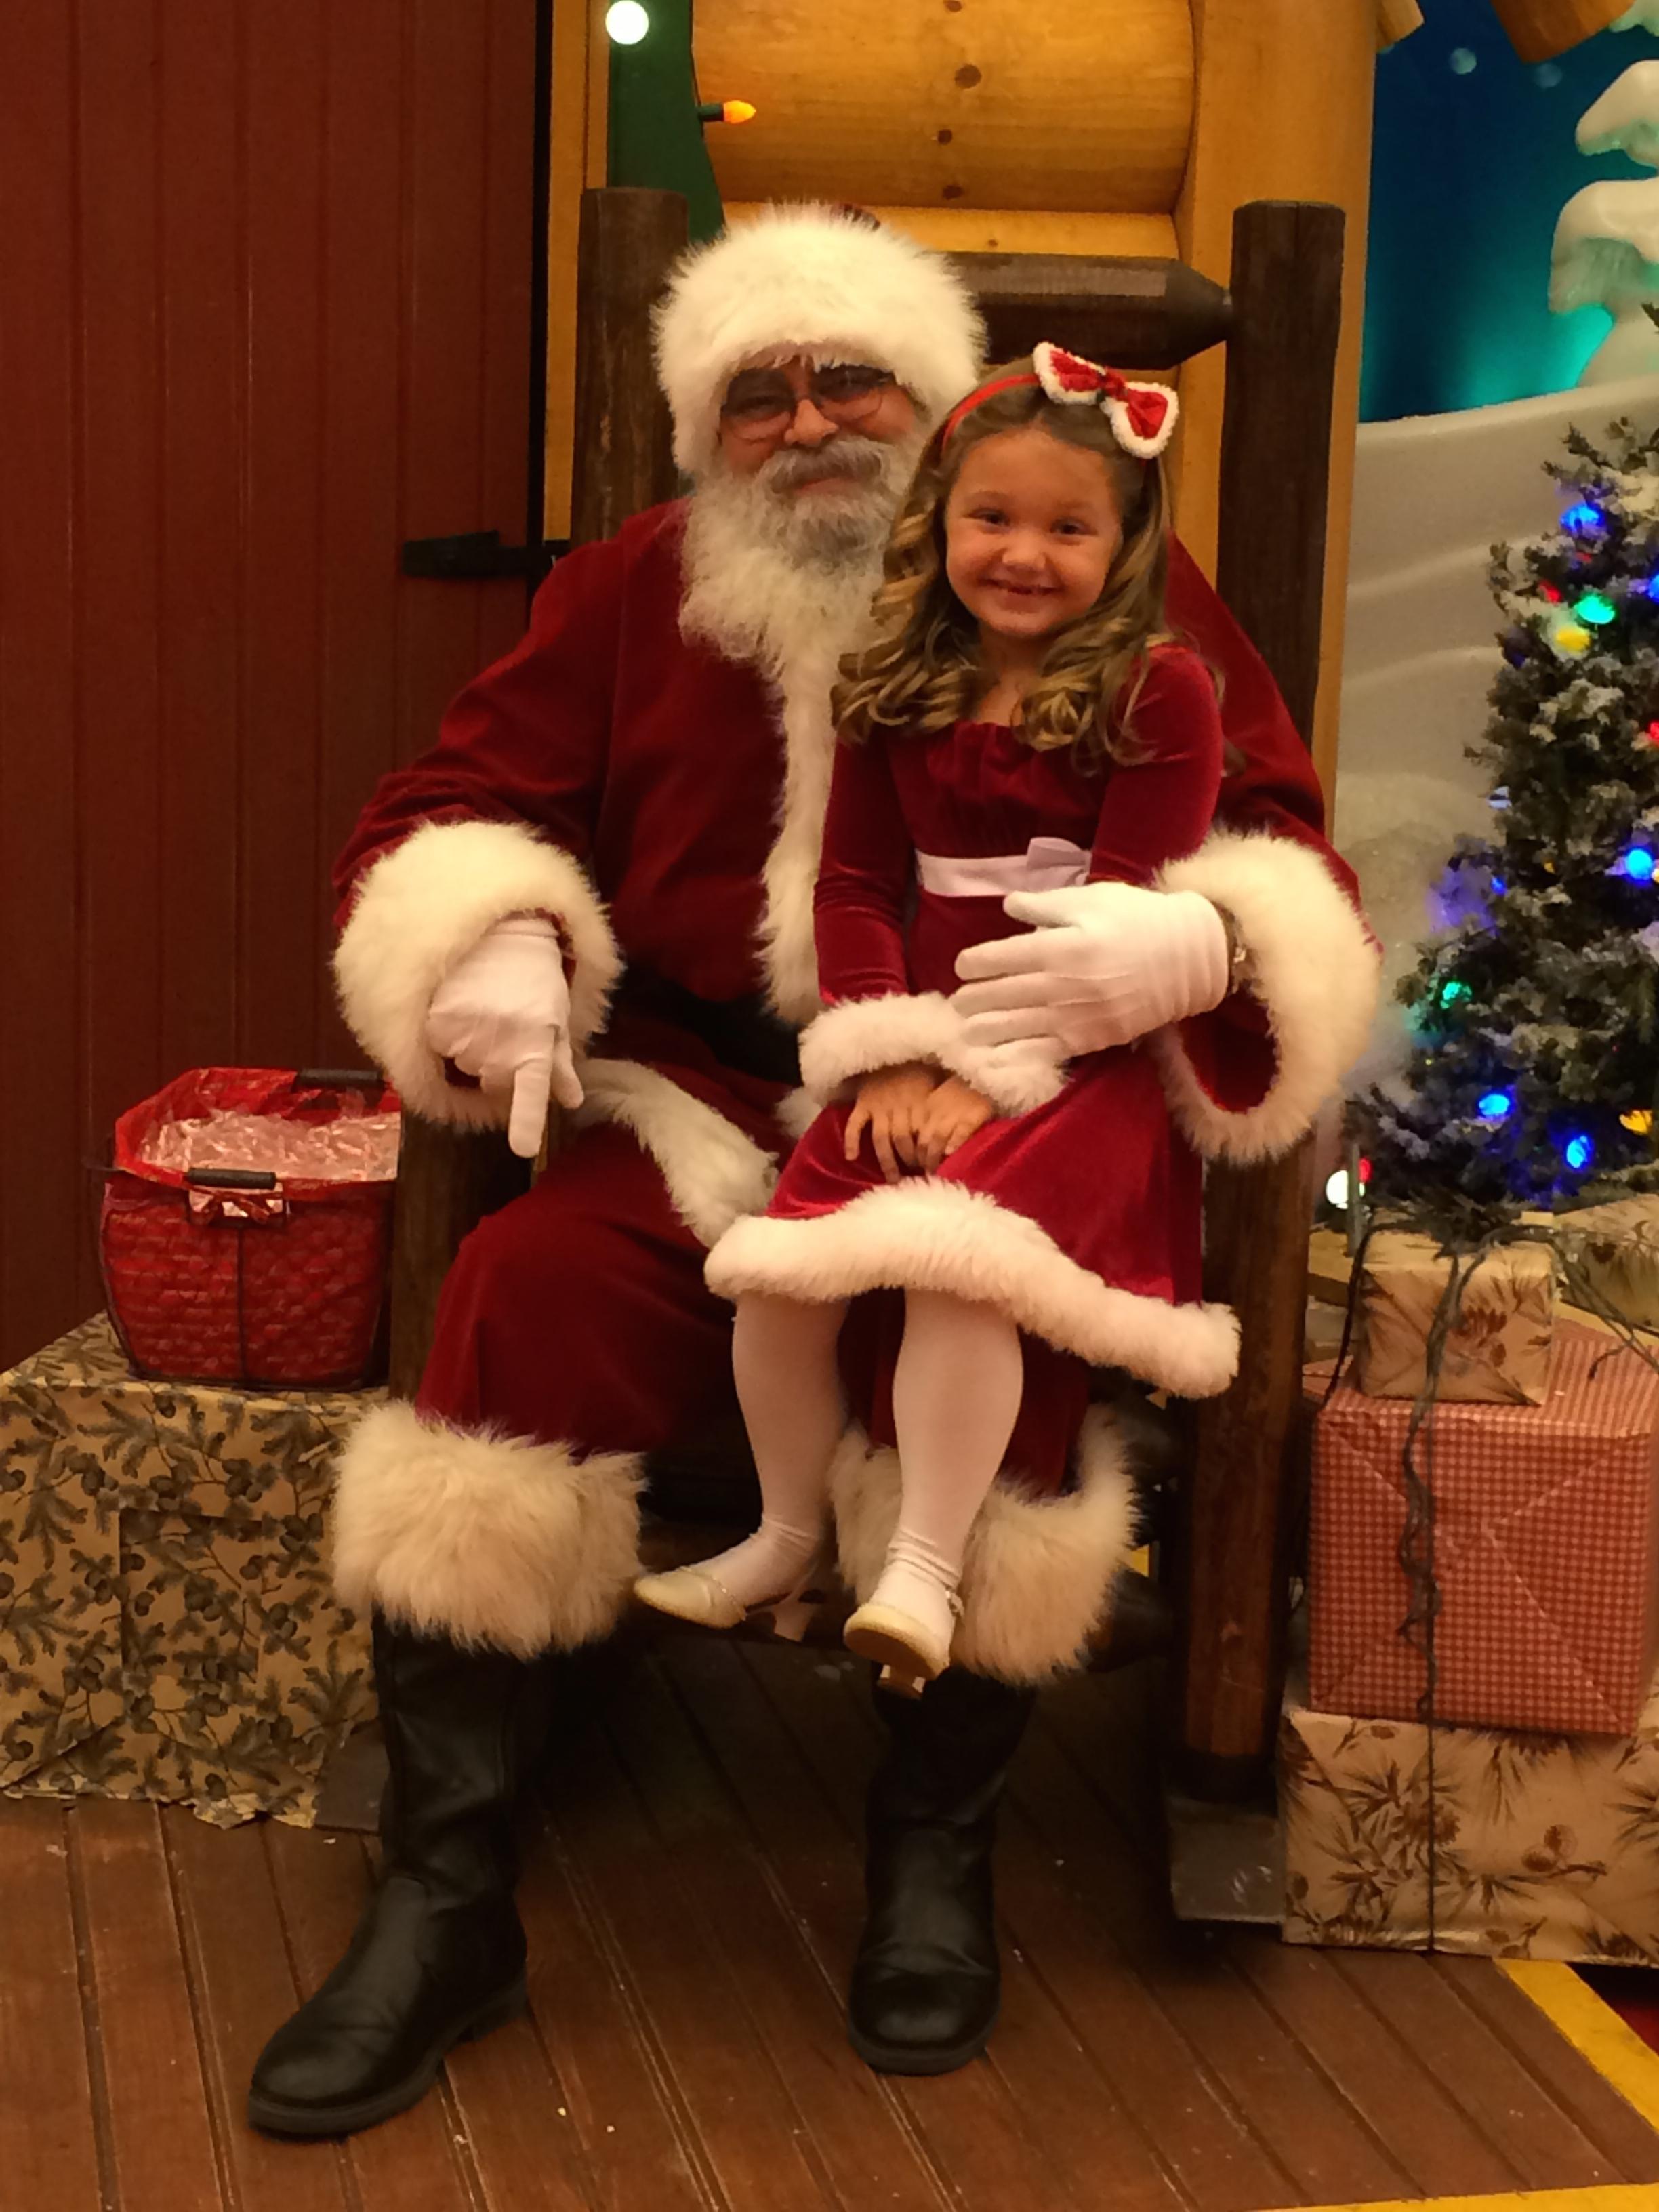 real magic-child sitting on santa's lap